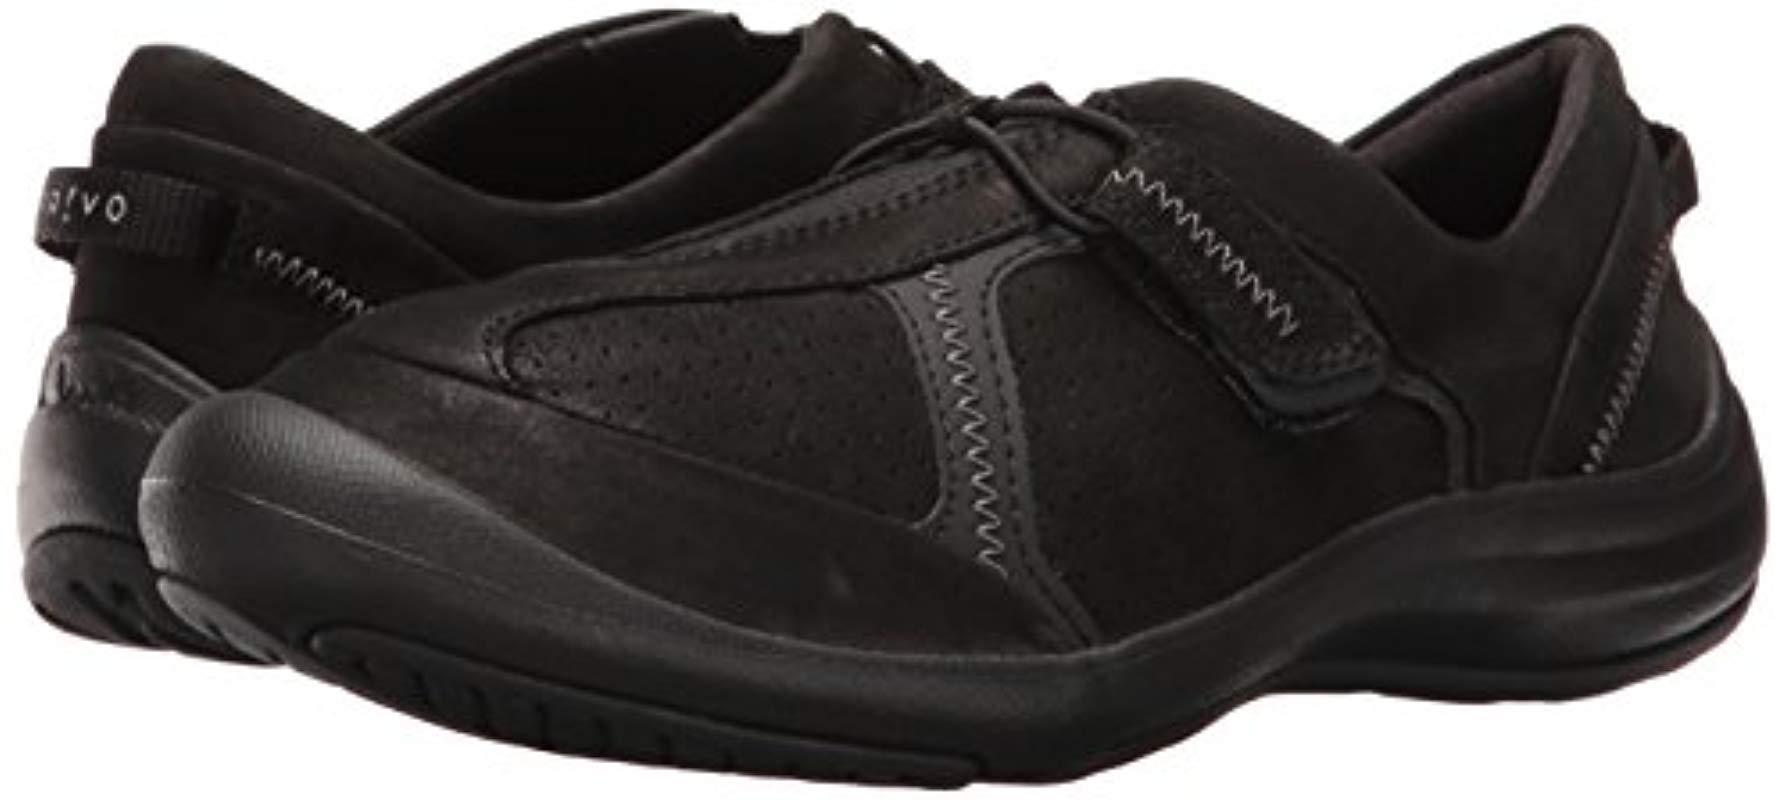 Clarks Asney Slipon Fashion Sneaker in Black Nubuck (Black)